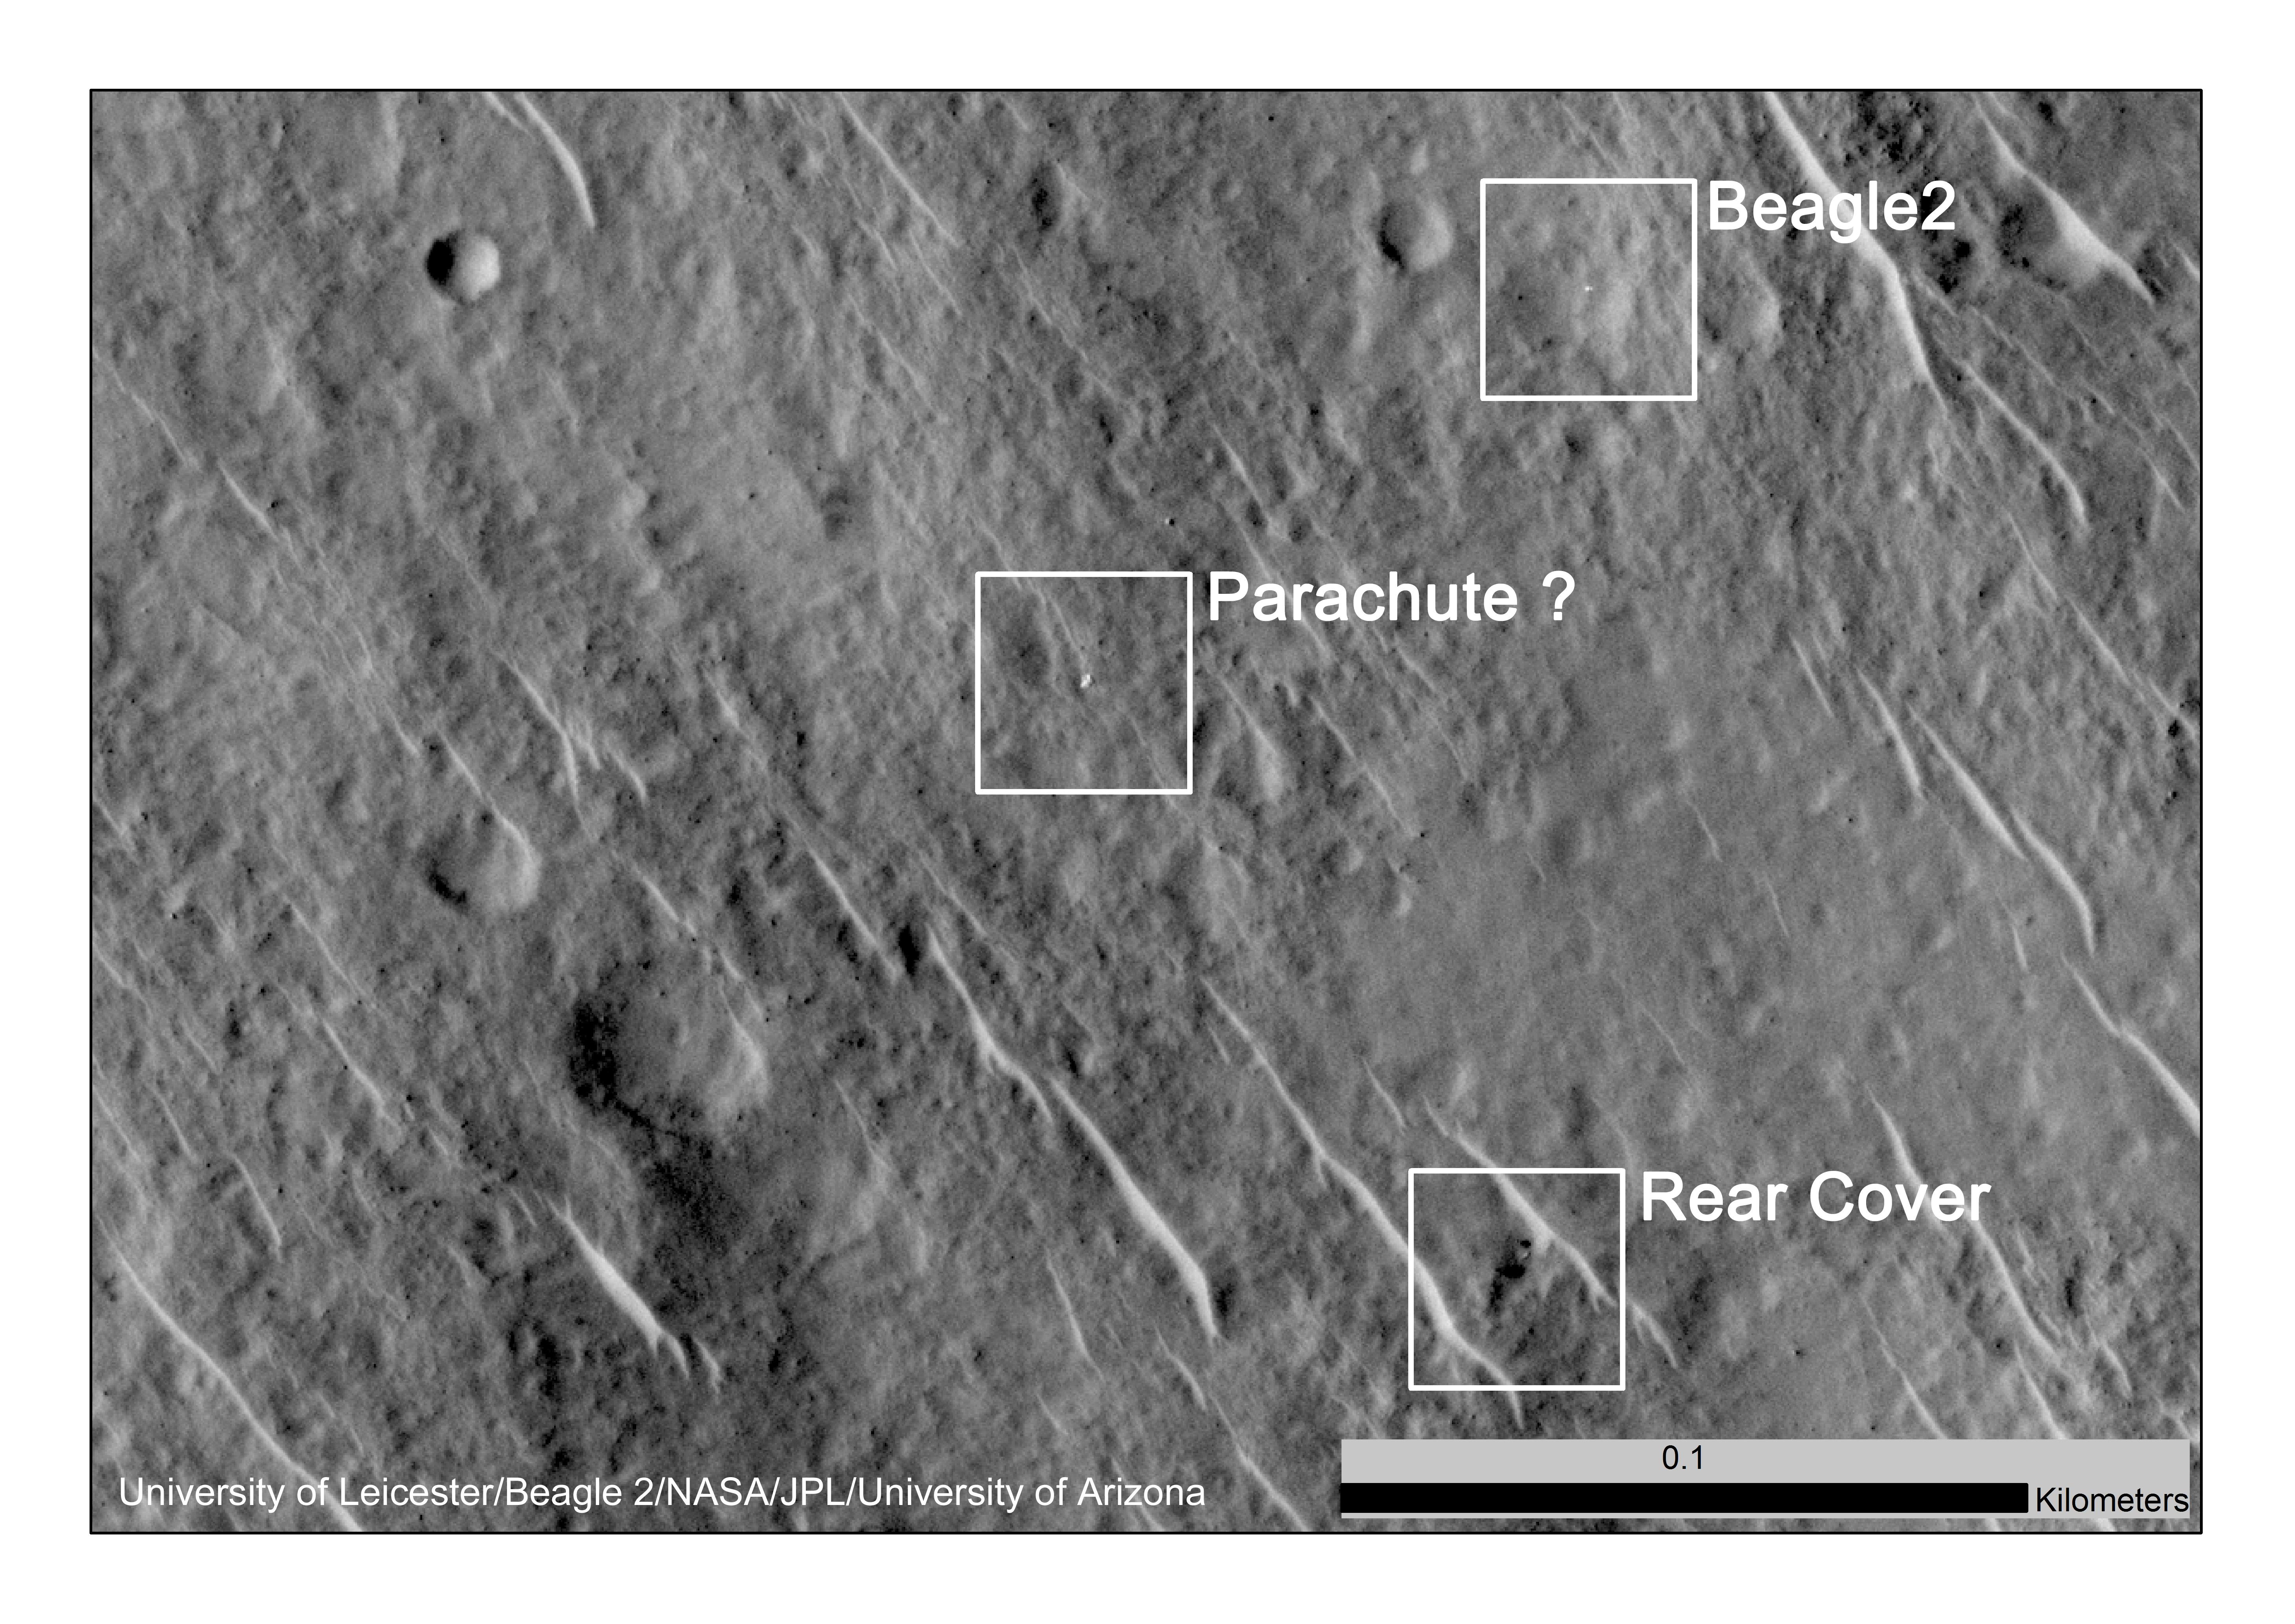 lost 2003 mars lander found by mars reconnaissance